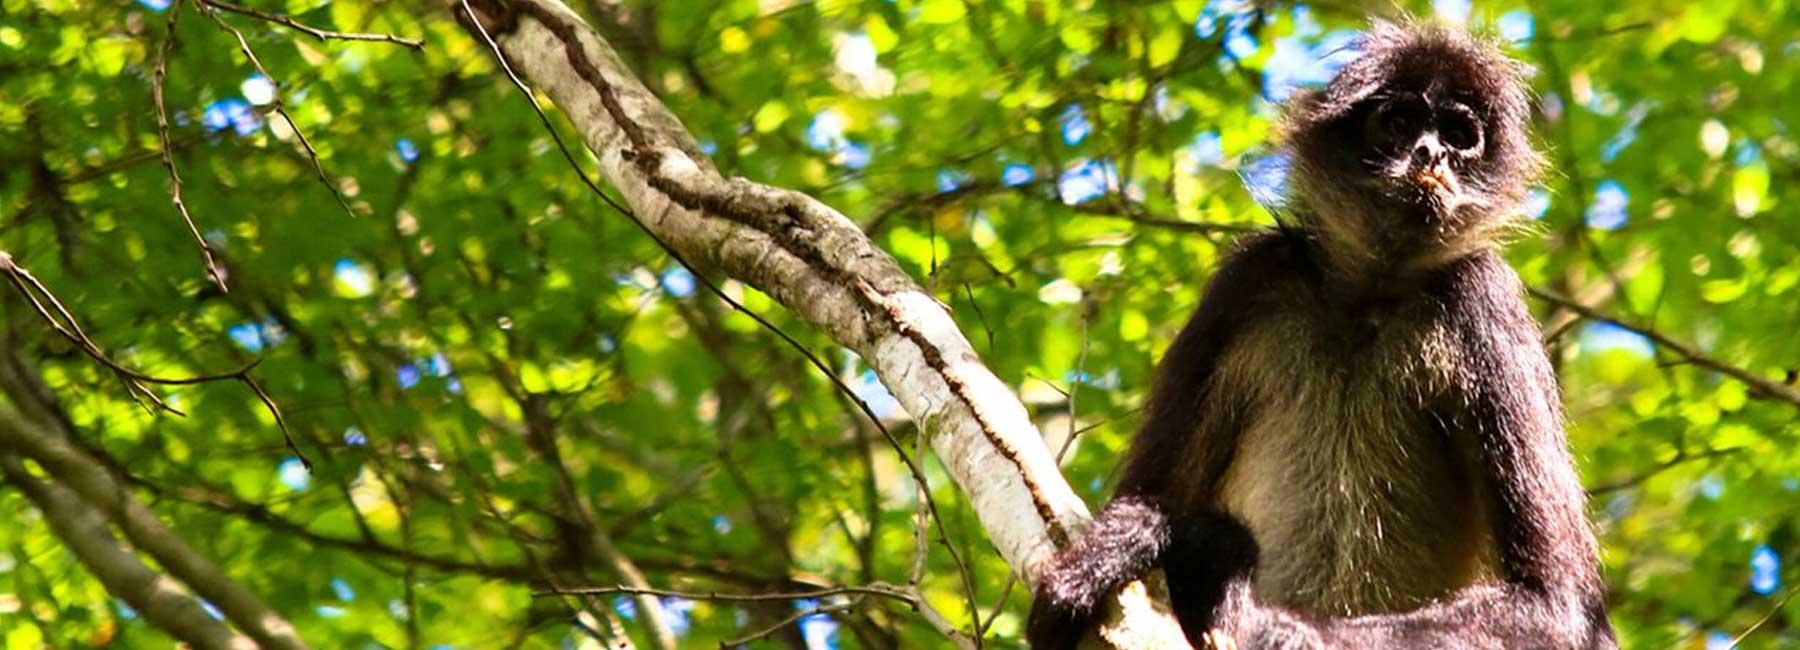 Punta Laguna Monkey Sanctuary Private Tour Photo Workshop